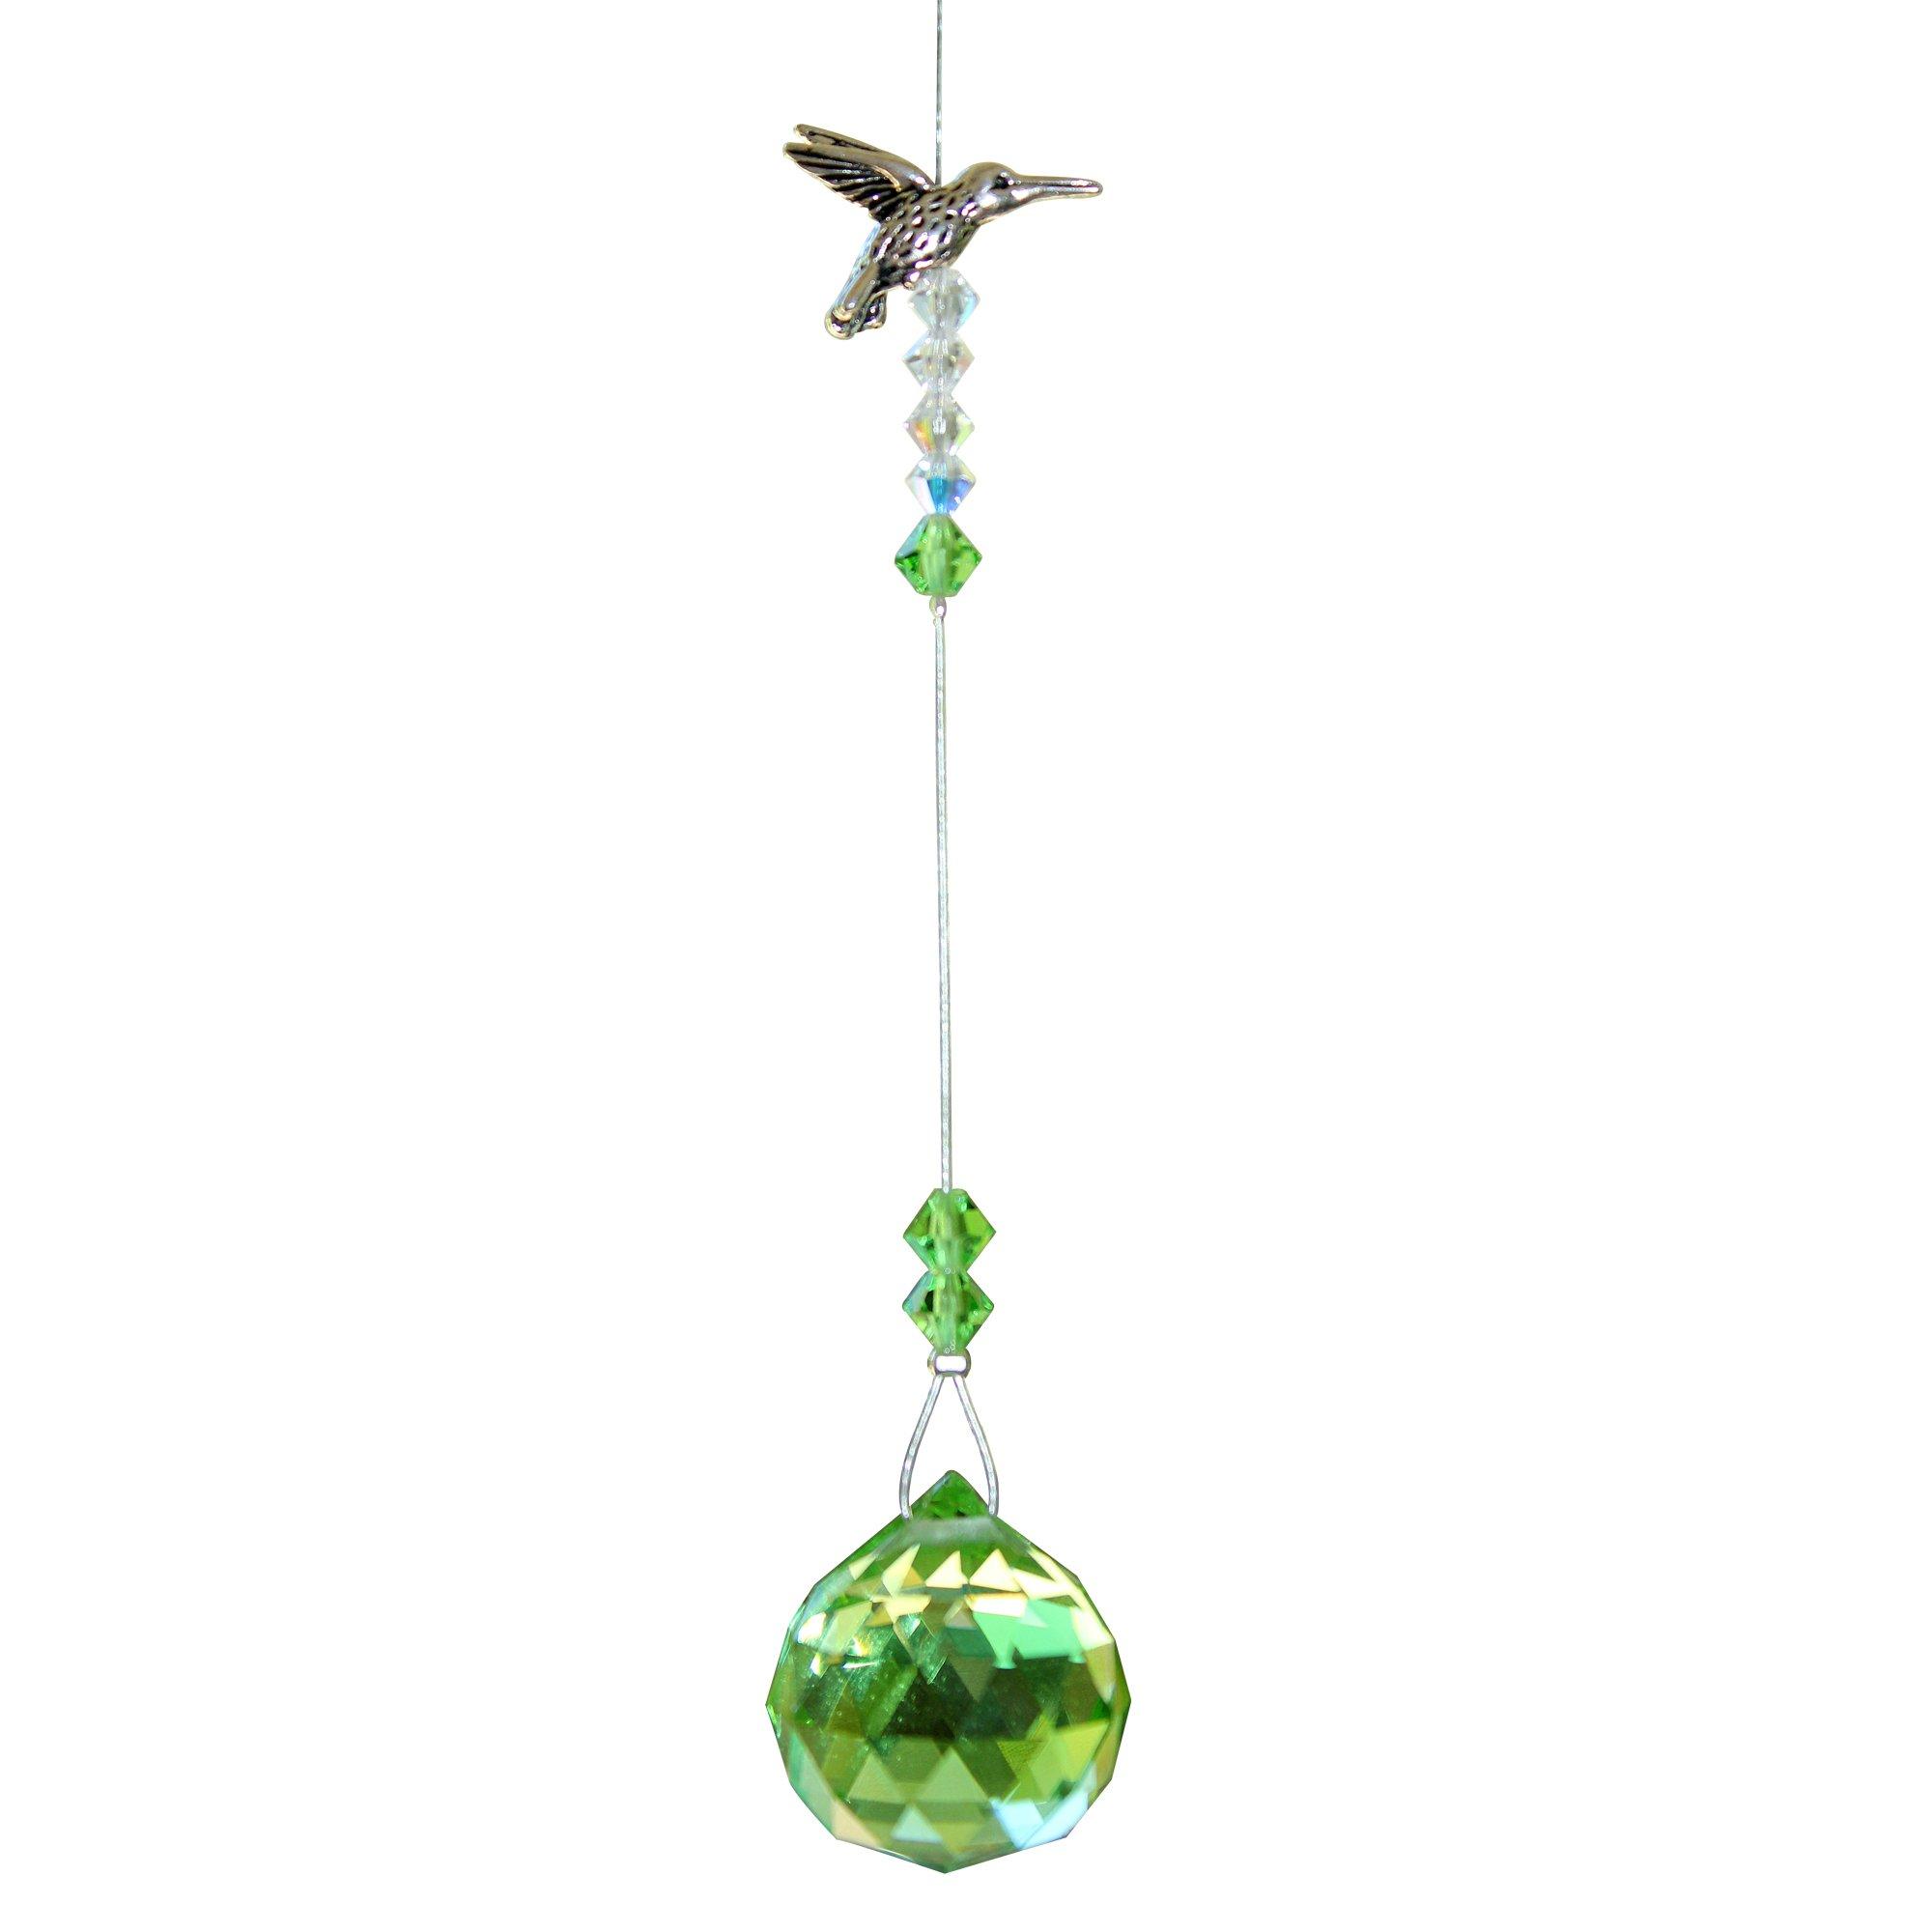 Hummingbird Mini with Crystal Ball - Rainbow Maker - Crystal Suncatcher - Home, Living Room, Bedroom, Kitchen, Car Decoration - Porch Decor - Sun Catcher - Hangings Crystal Glass Ornament - Hummingbird Figurine